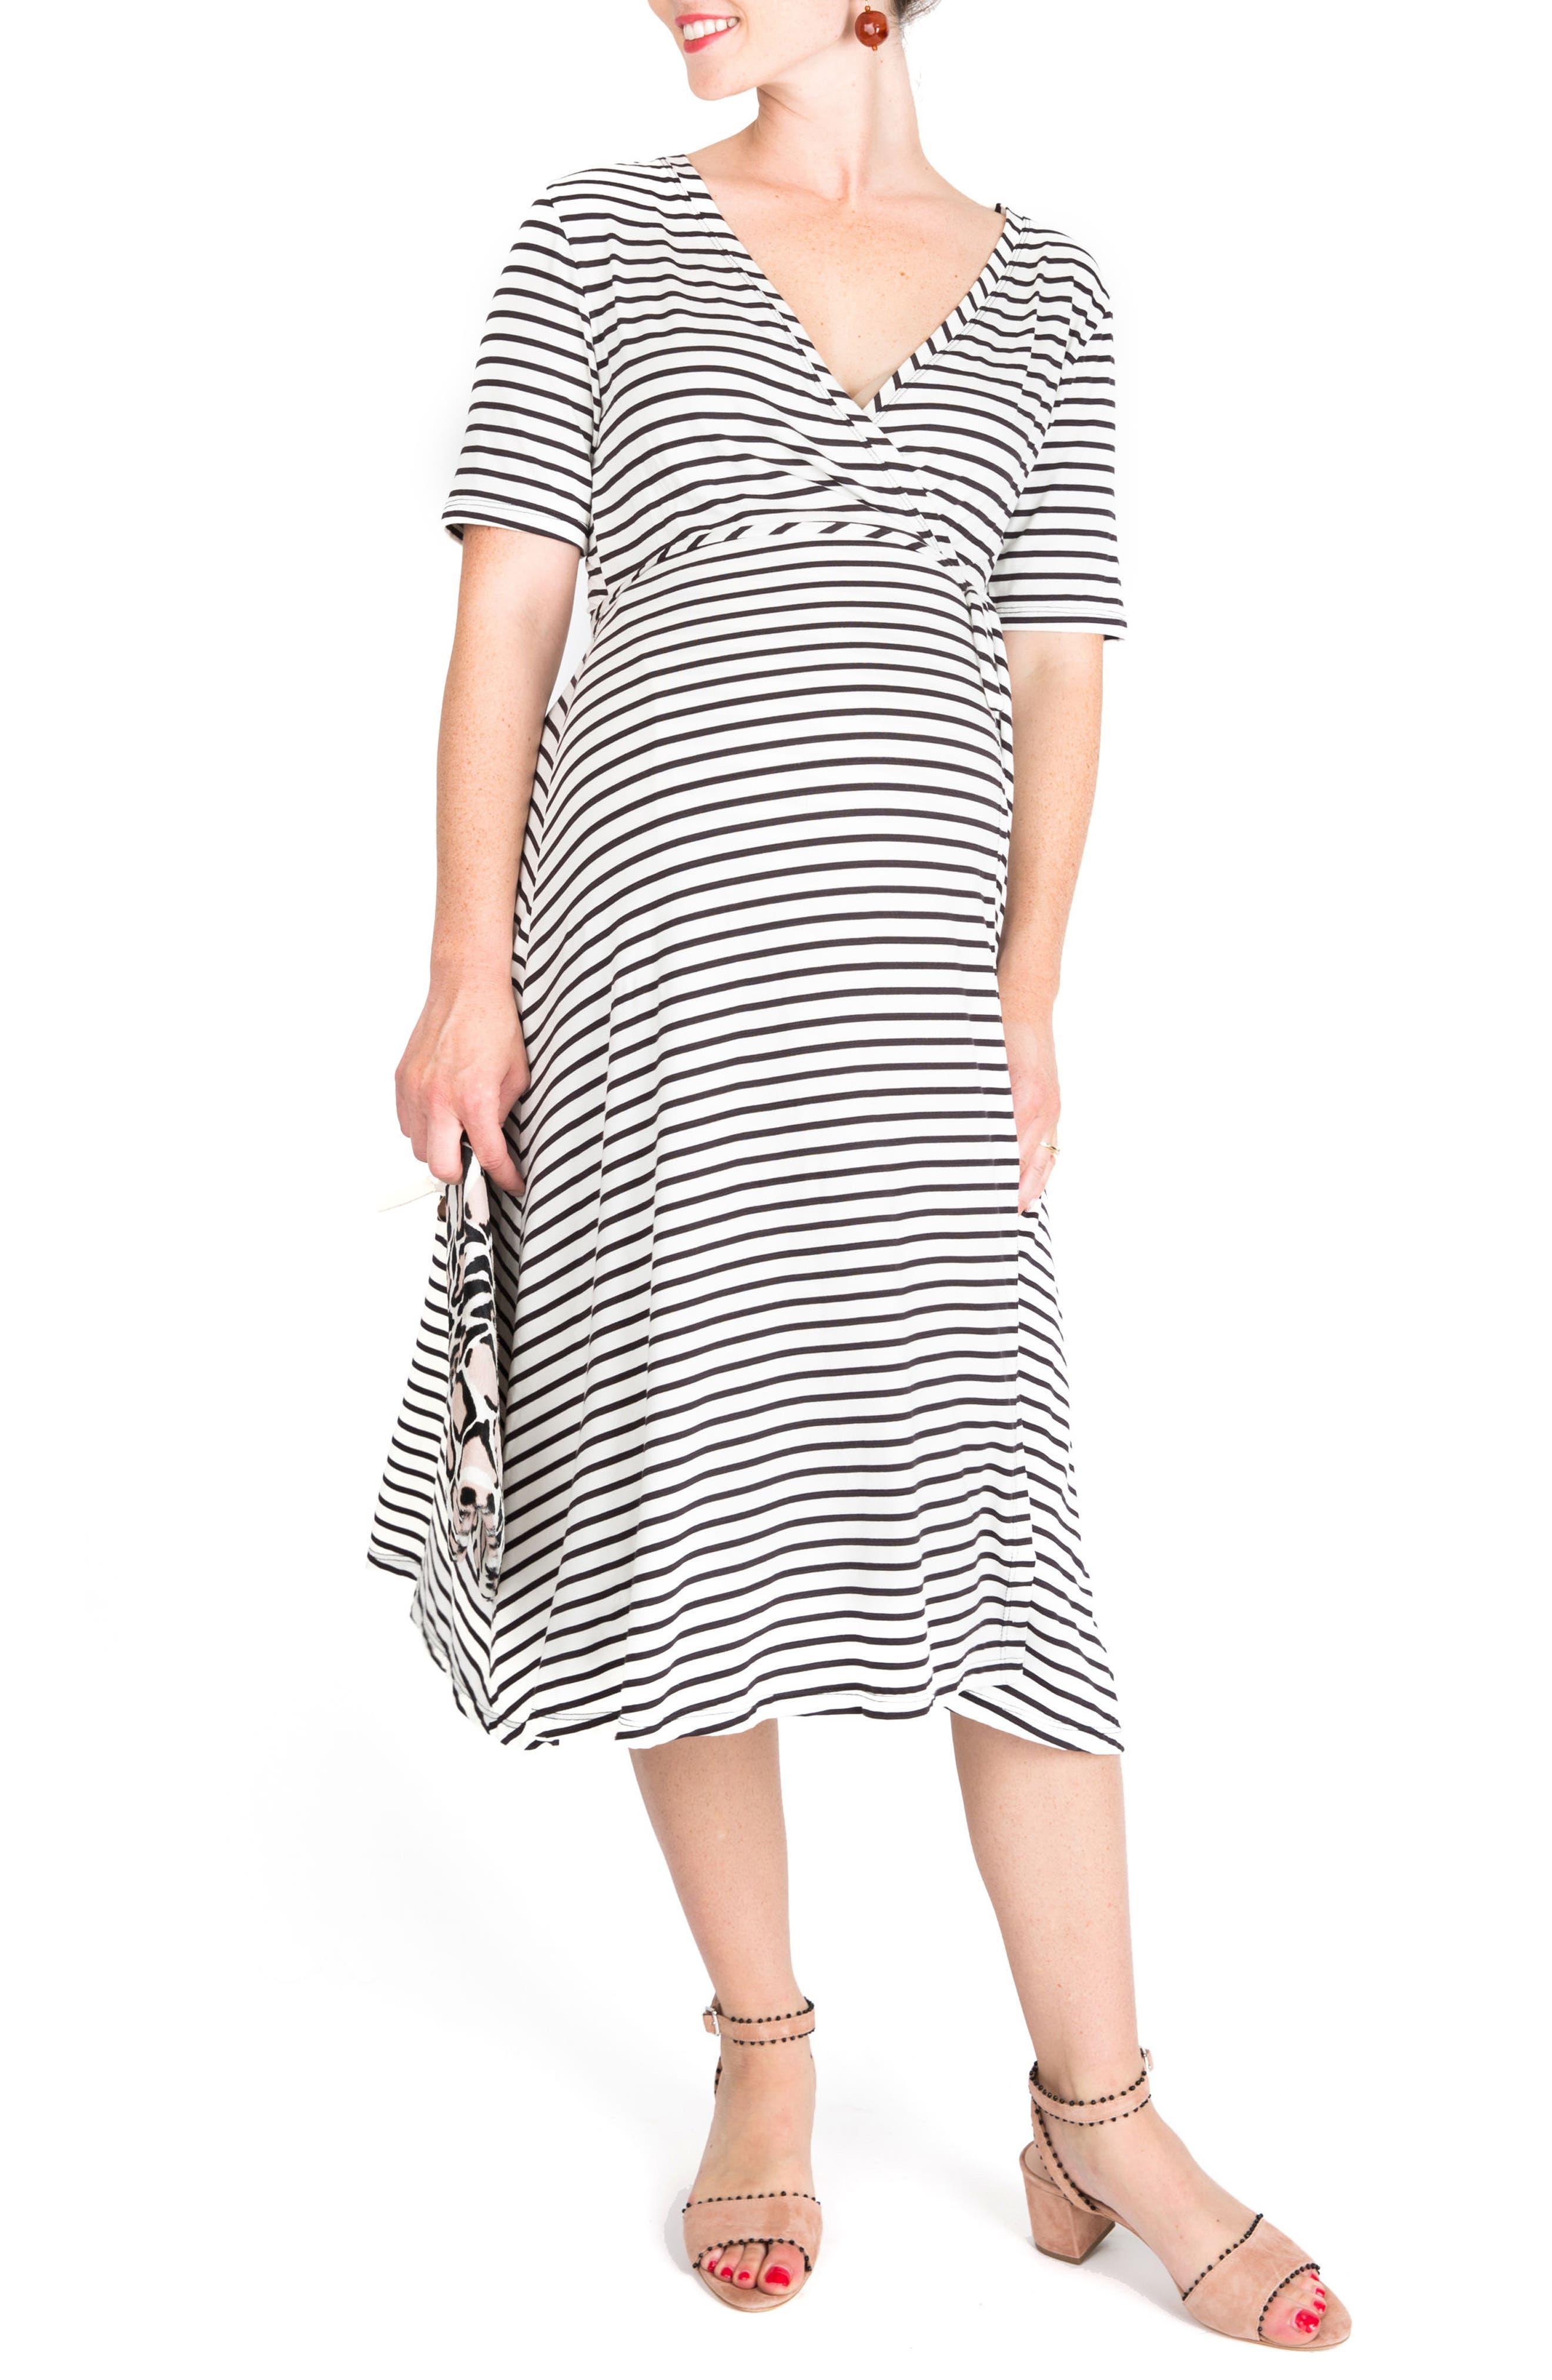 Maya Maternity/Nursing Wrap Dress,                         Main,                         color, Black/ White Stripe